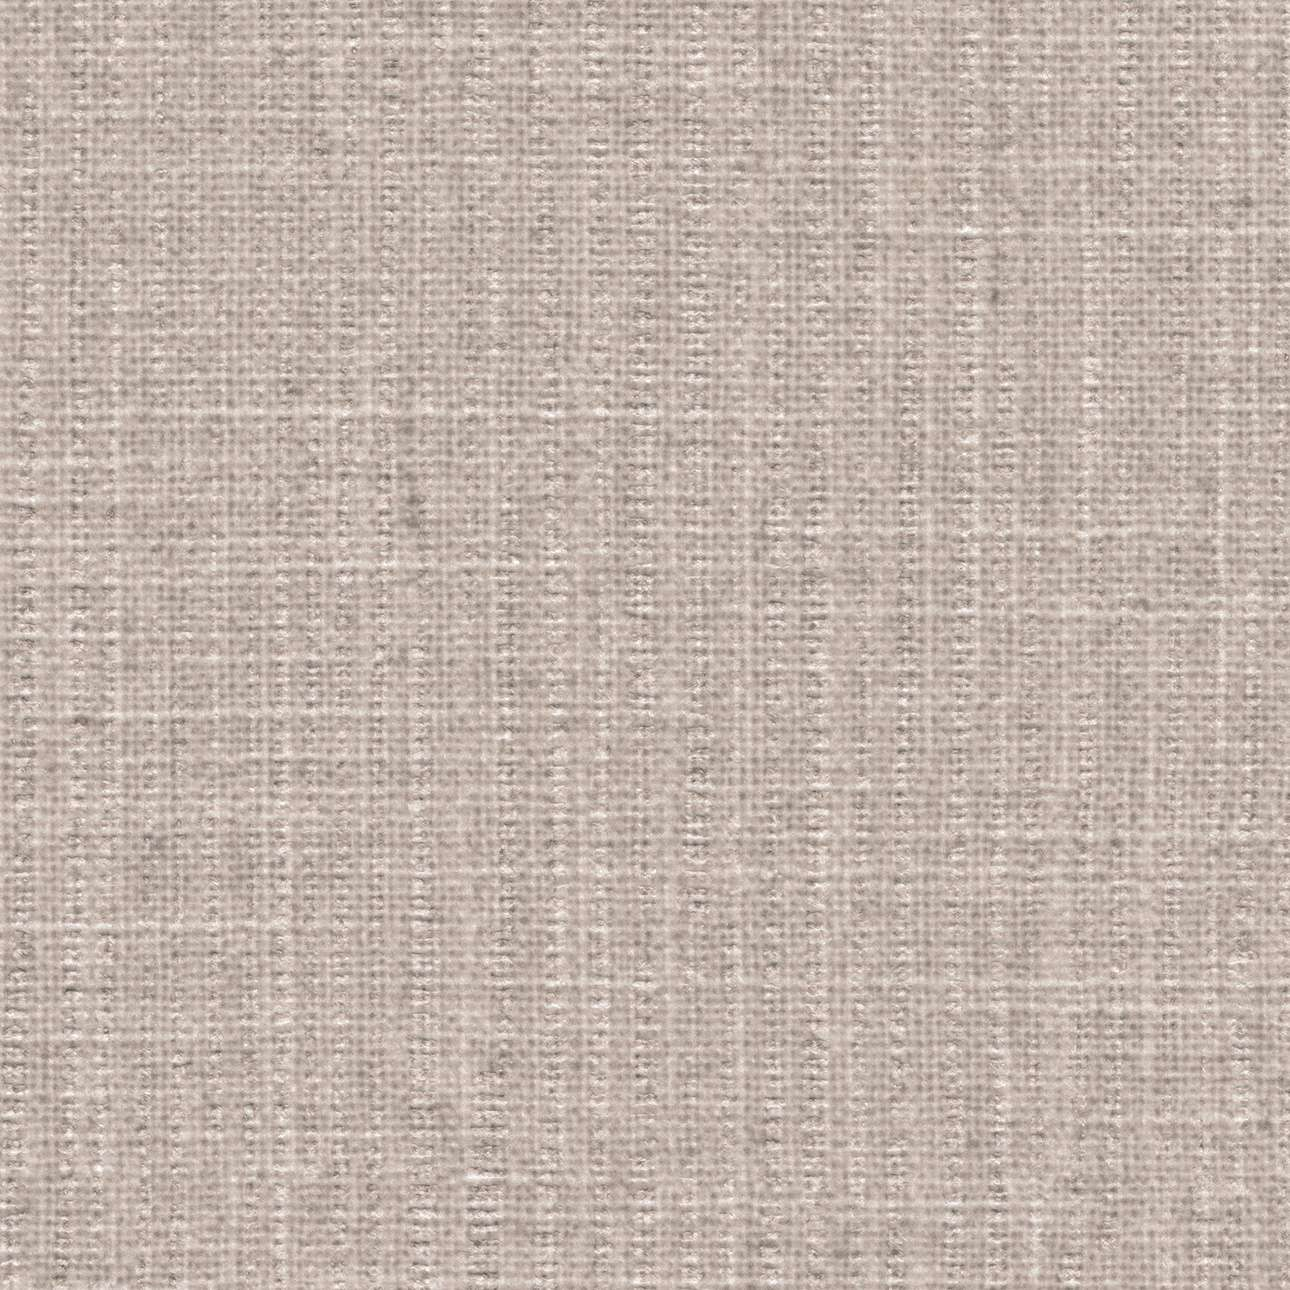 Living II 160-85 w kolekcji Living II, tkanina: 160-85